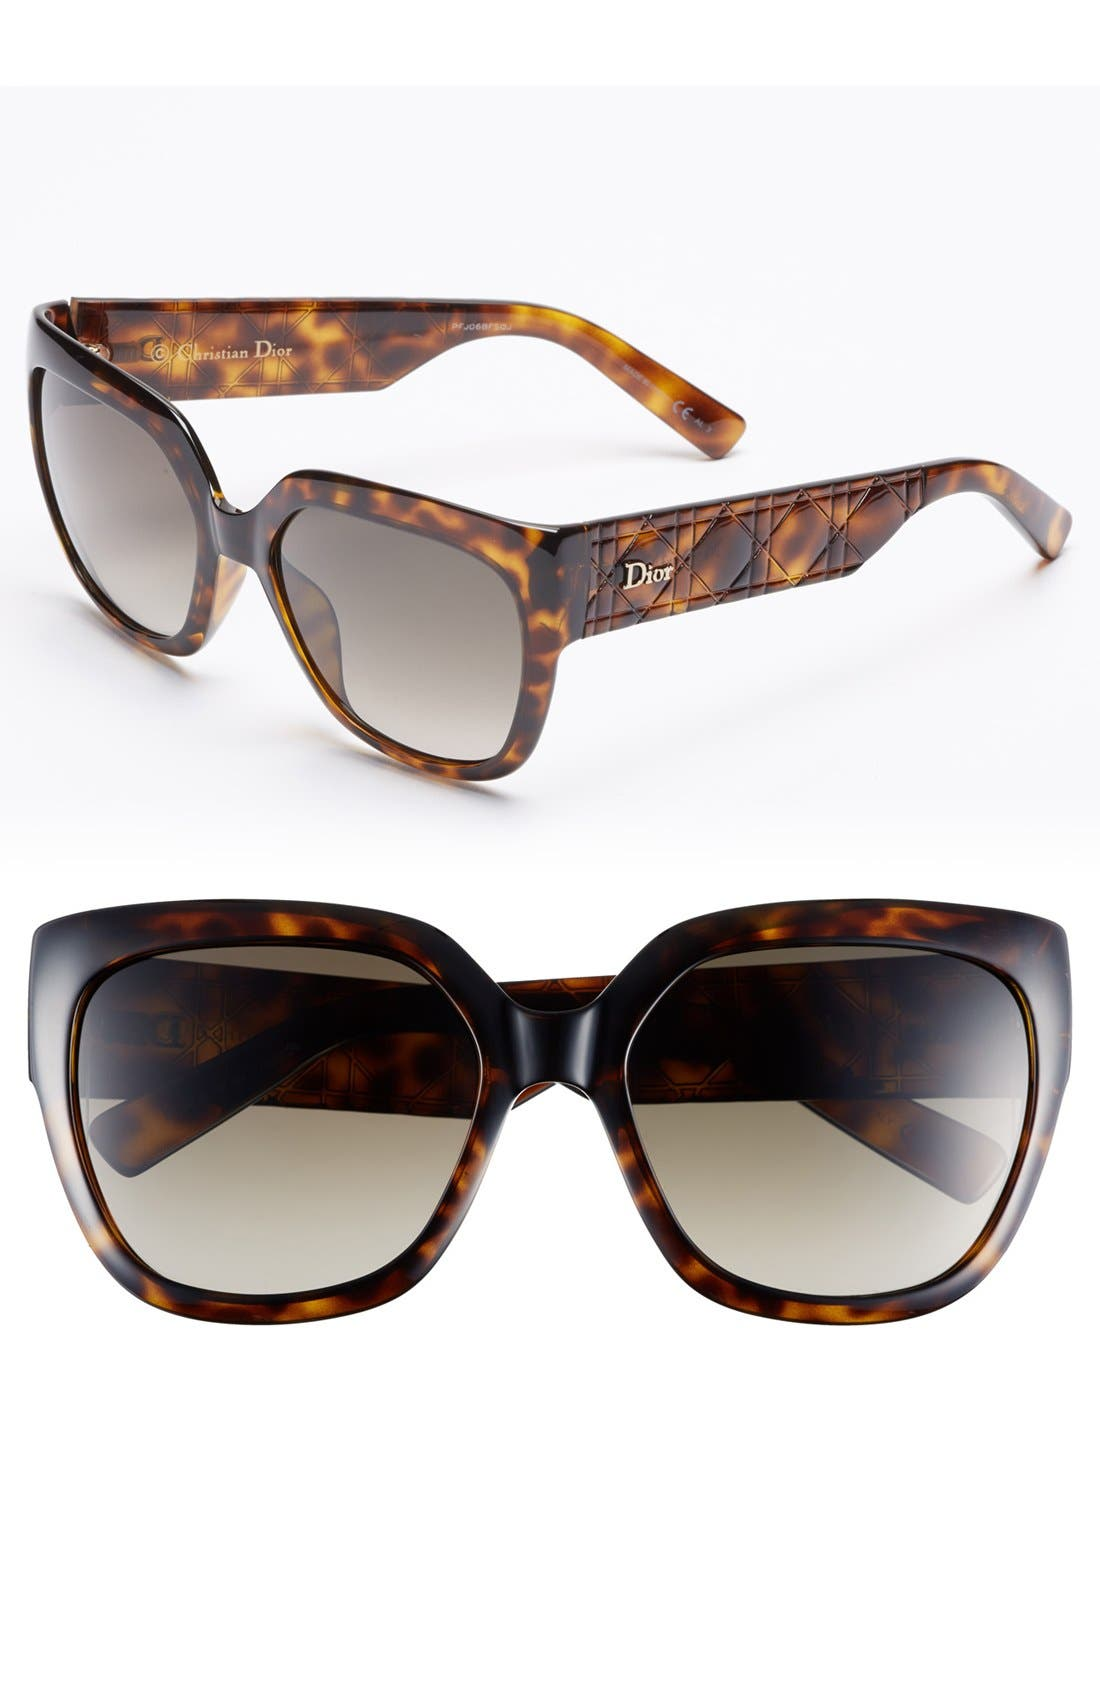 Main Image - Dior 'My Dior 3' 57mm Sunglasses